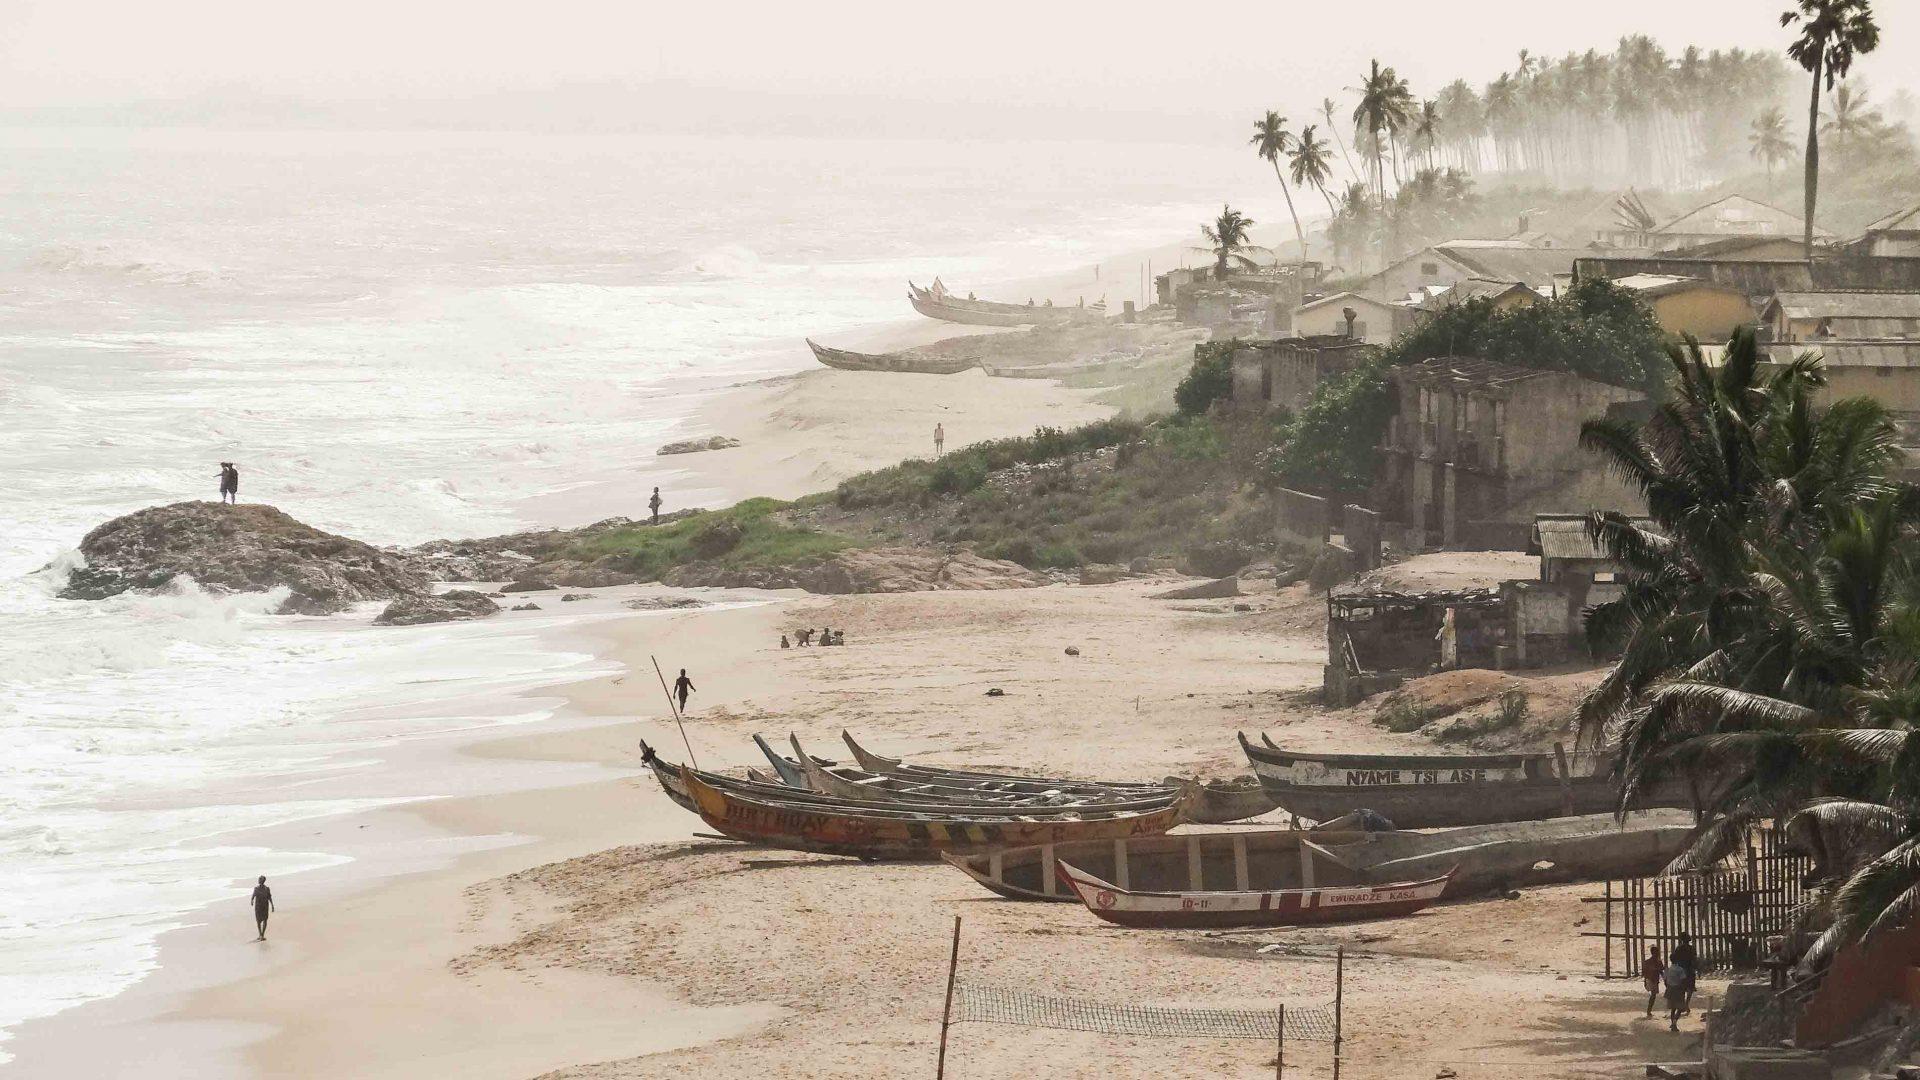 The coastline in Ghana.